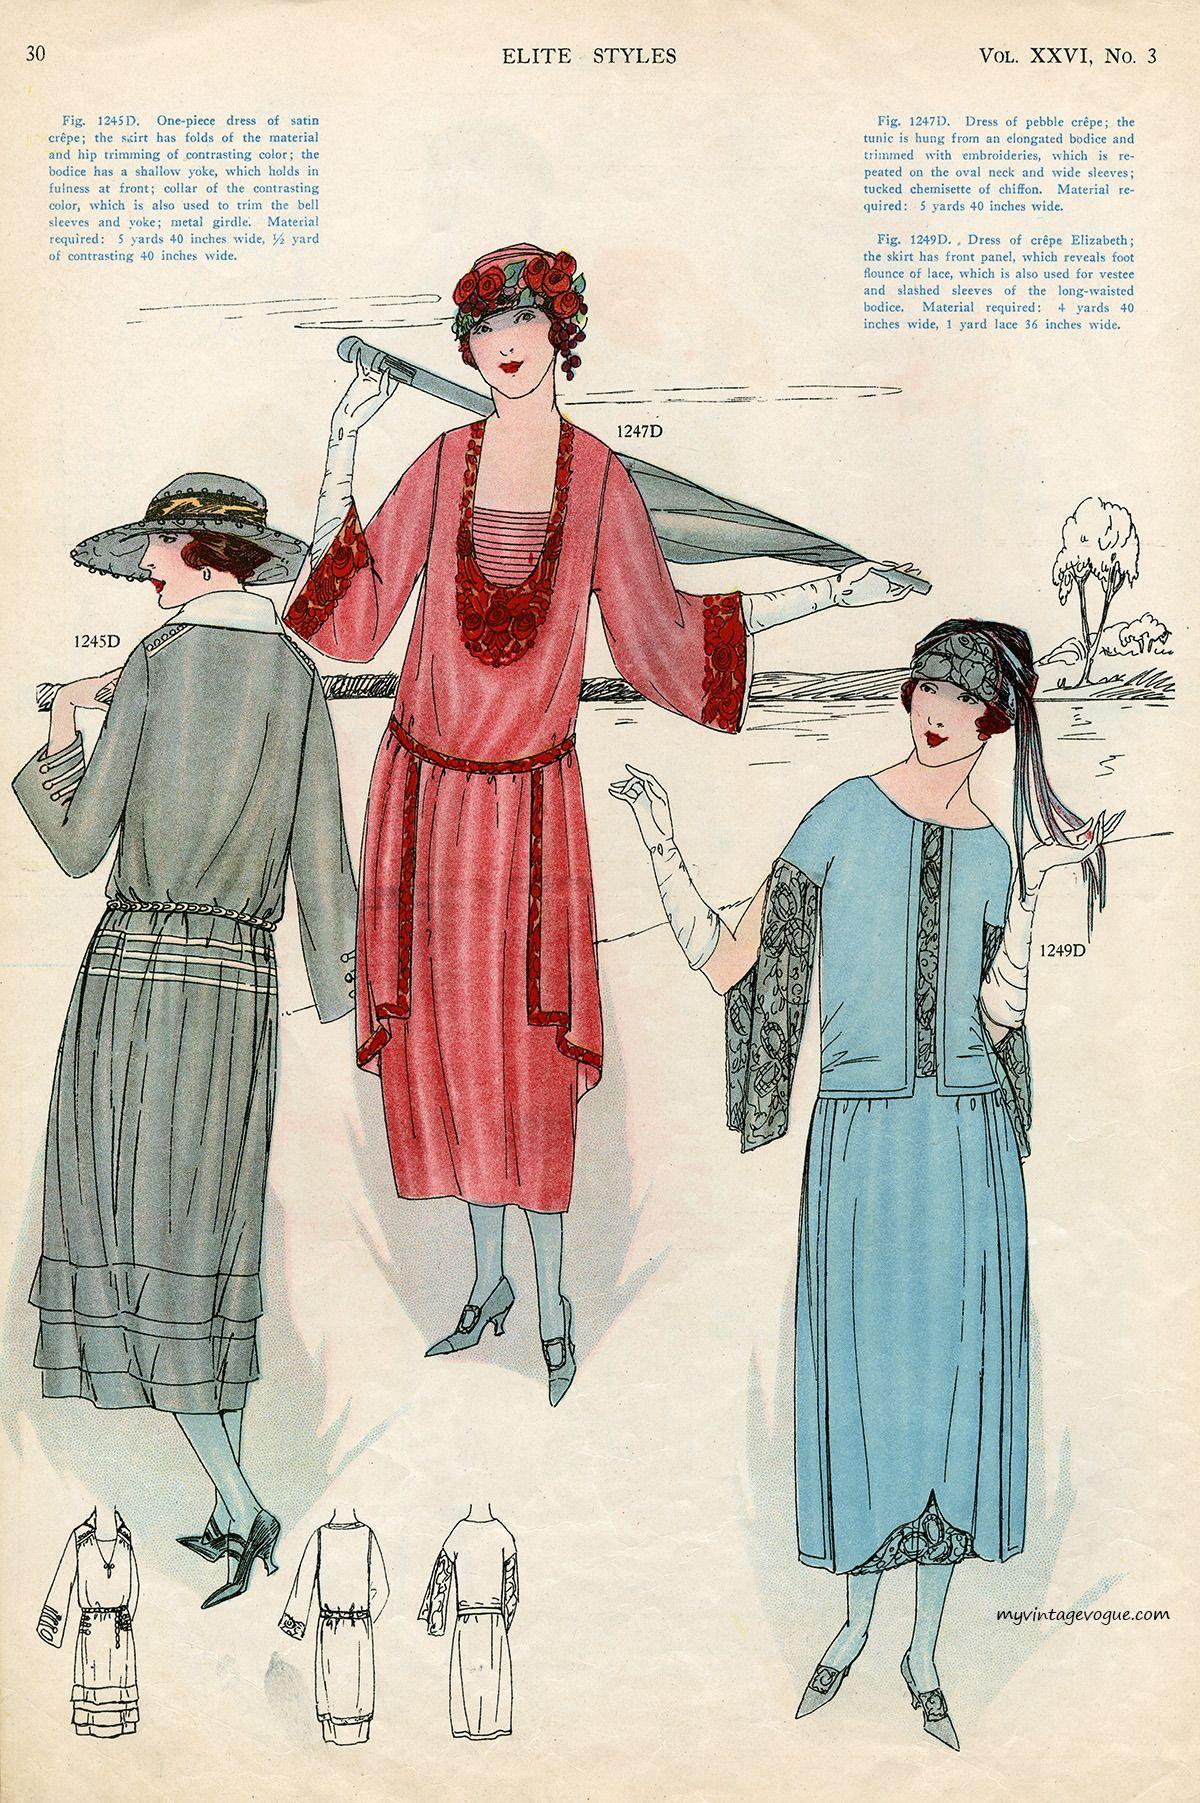 Elite styles magazine march fashion drawings